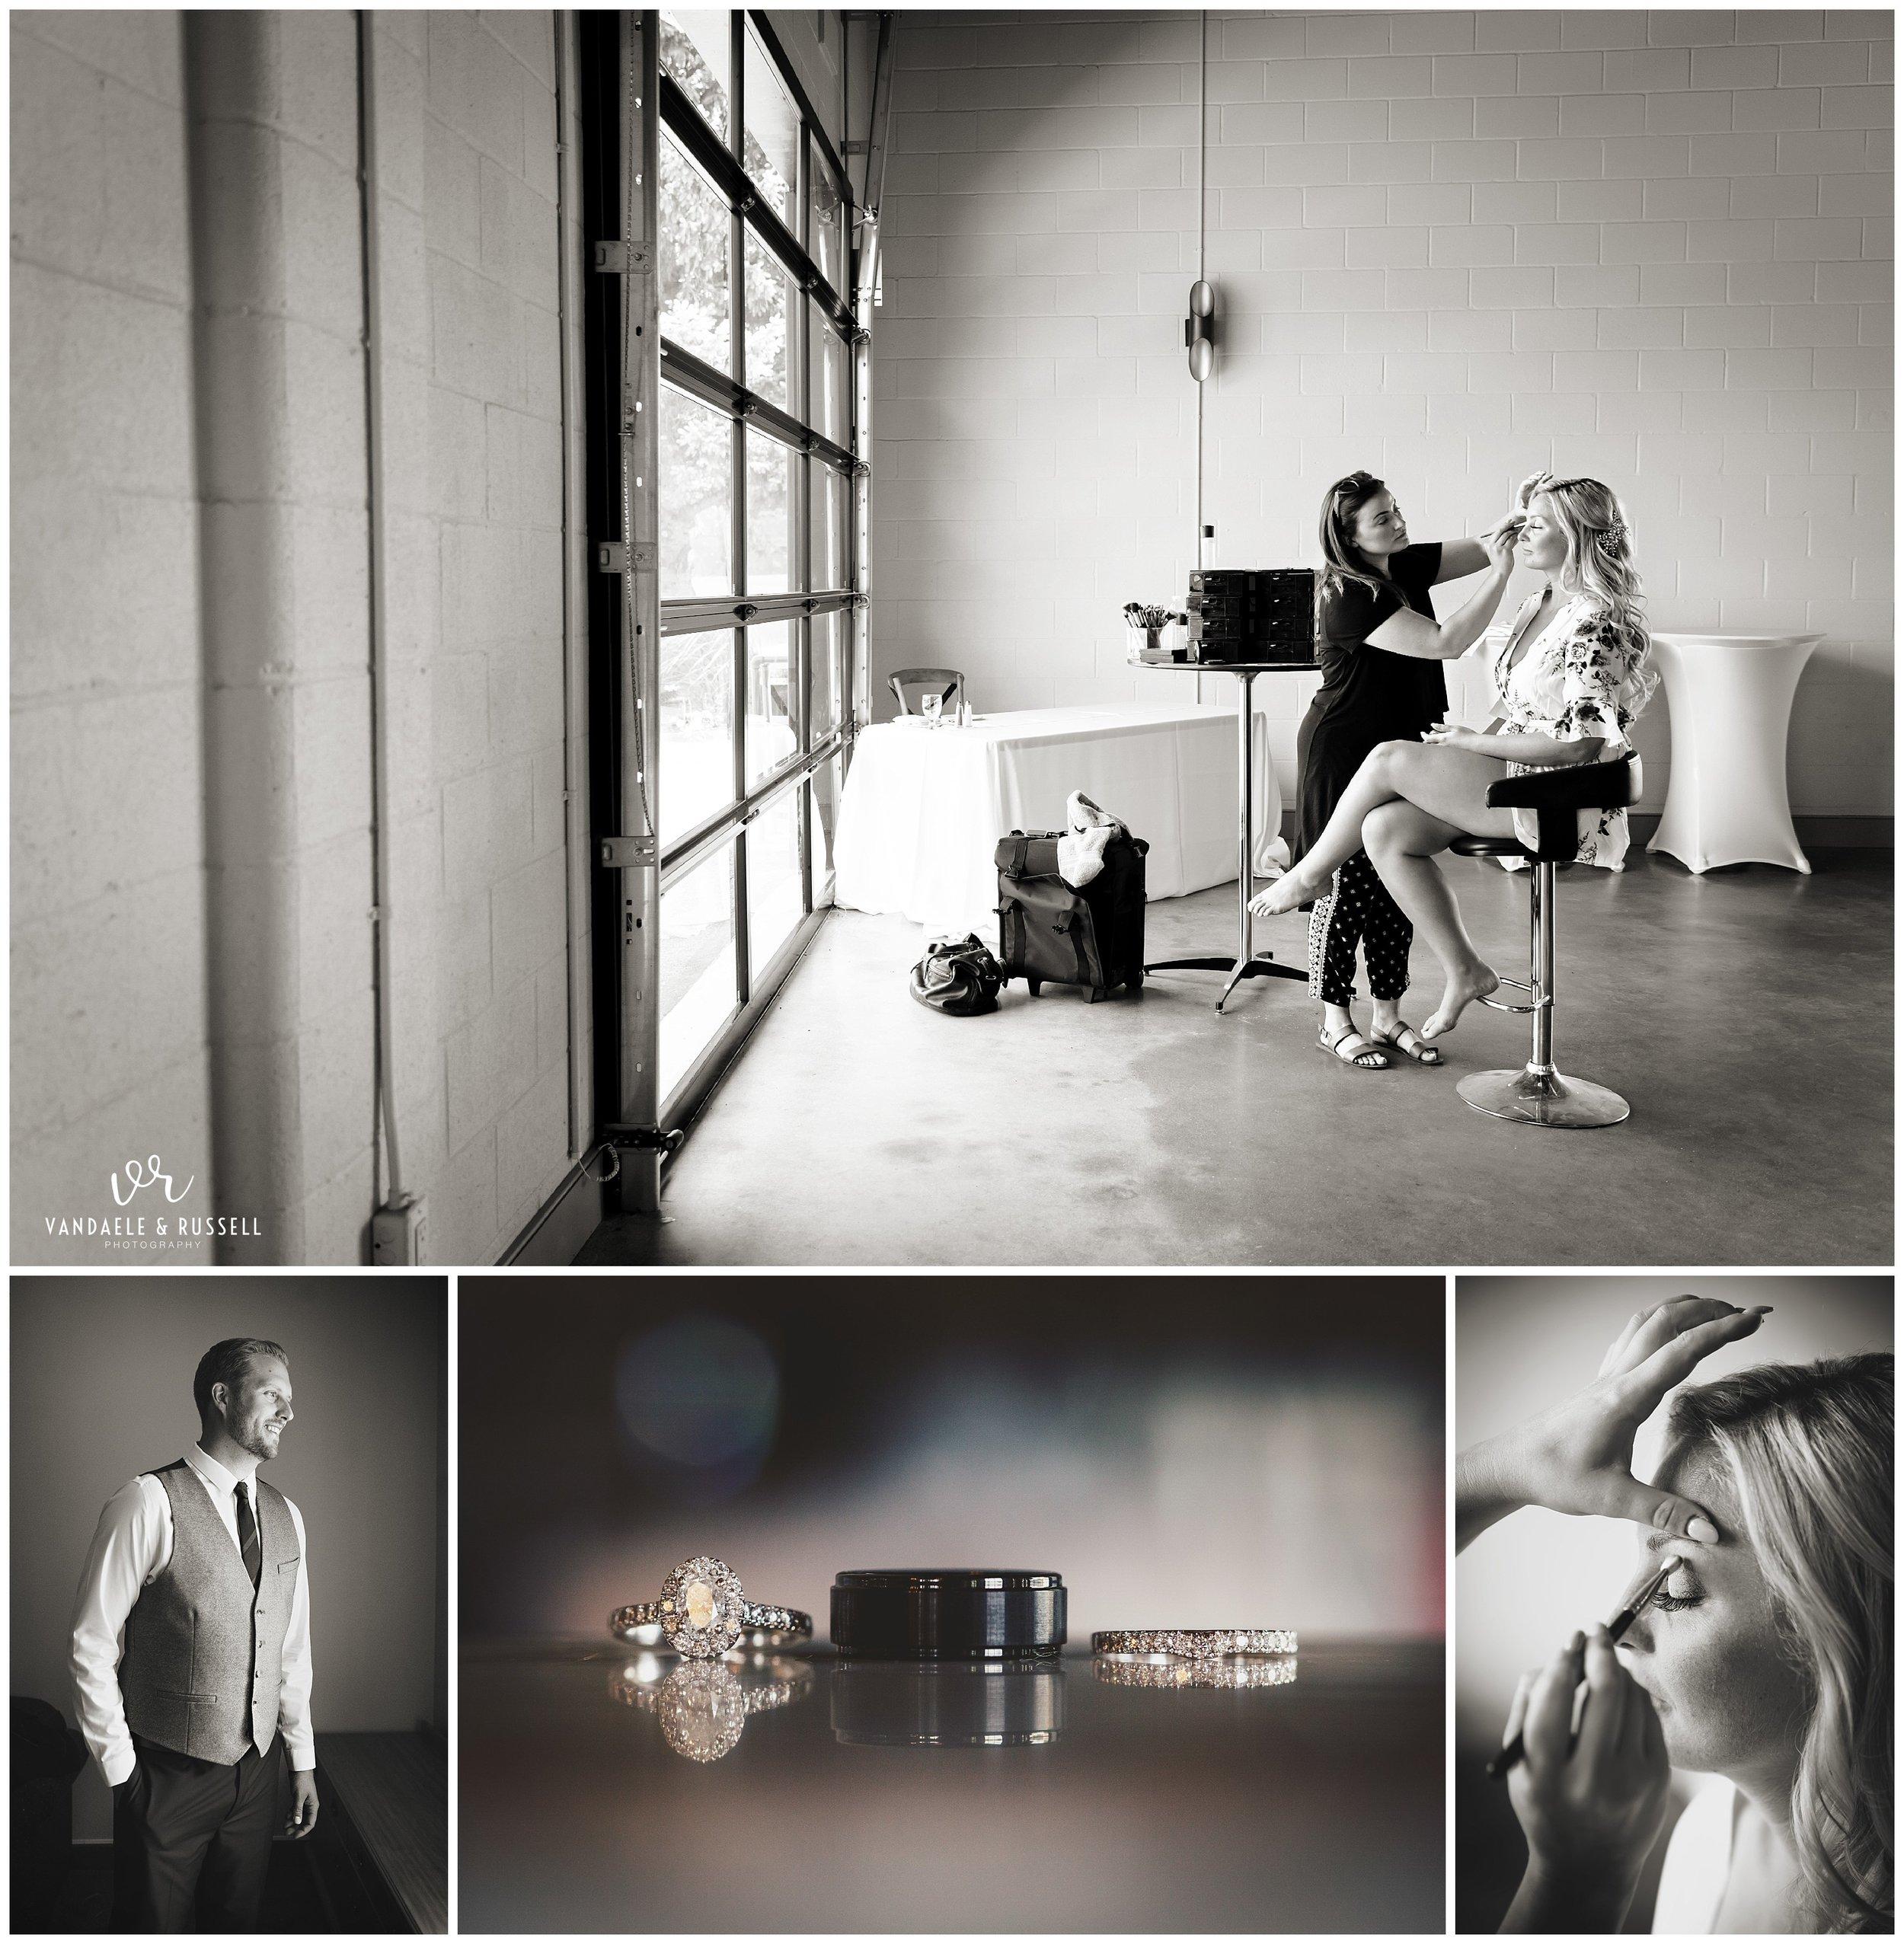 VanDaele-Russell-Wedding-Photography-London-Toronto-Ontario_0143.jpg